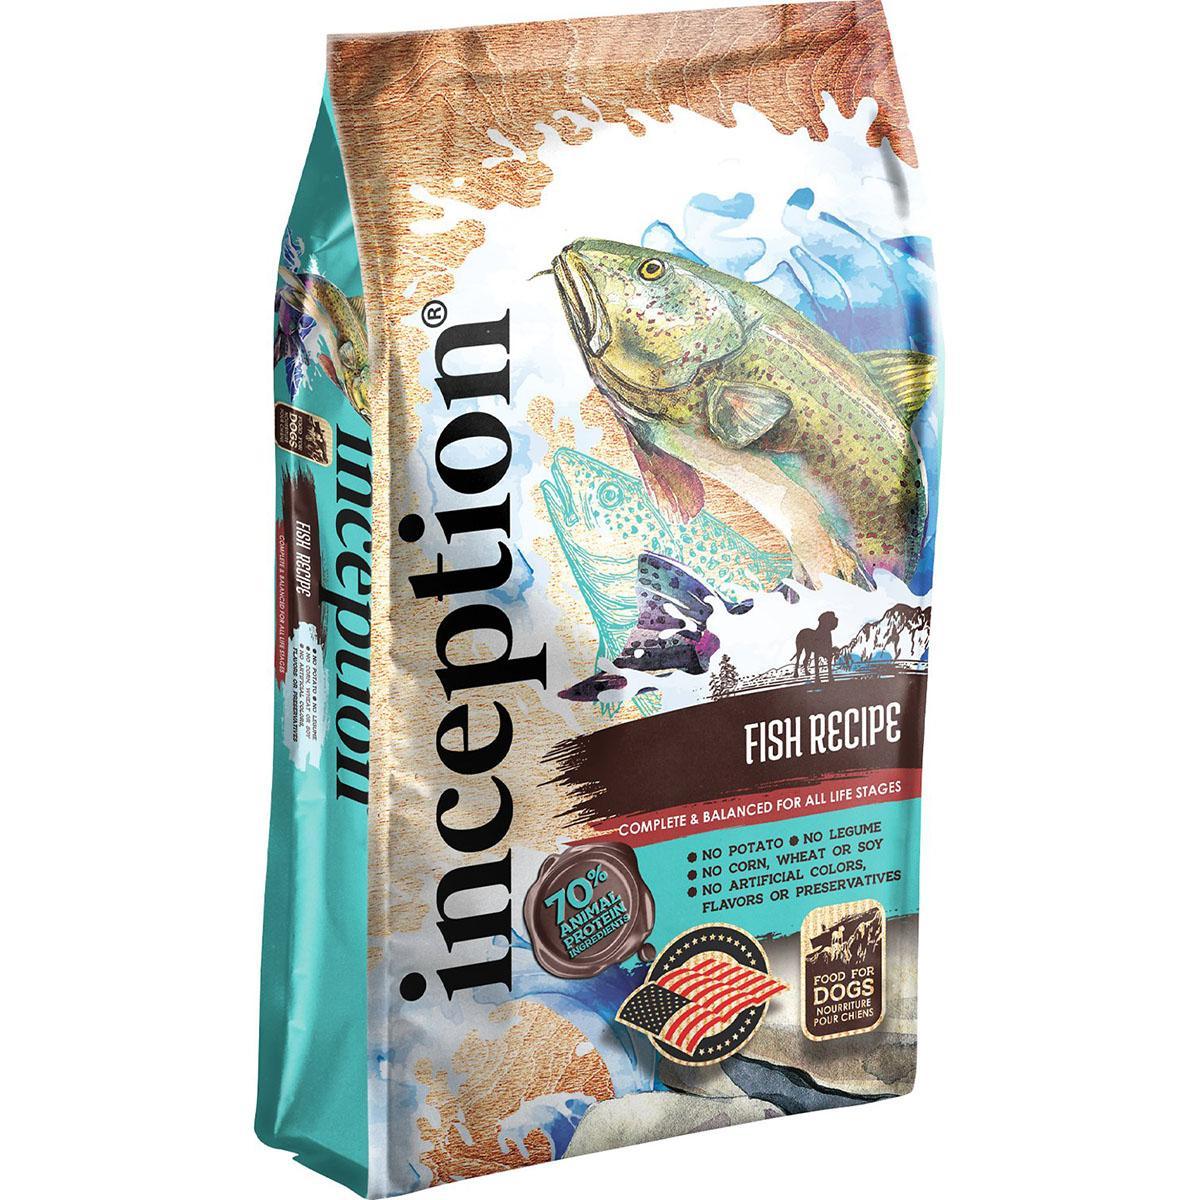 Inception Fish Recipe Dry Dog Food